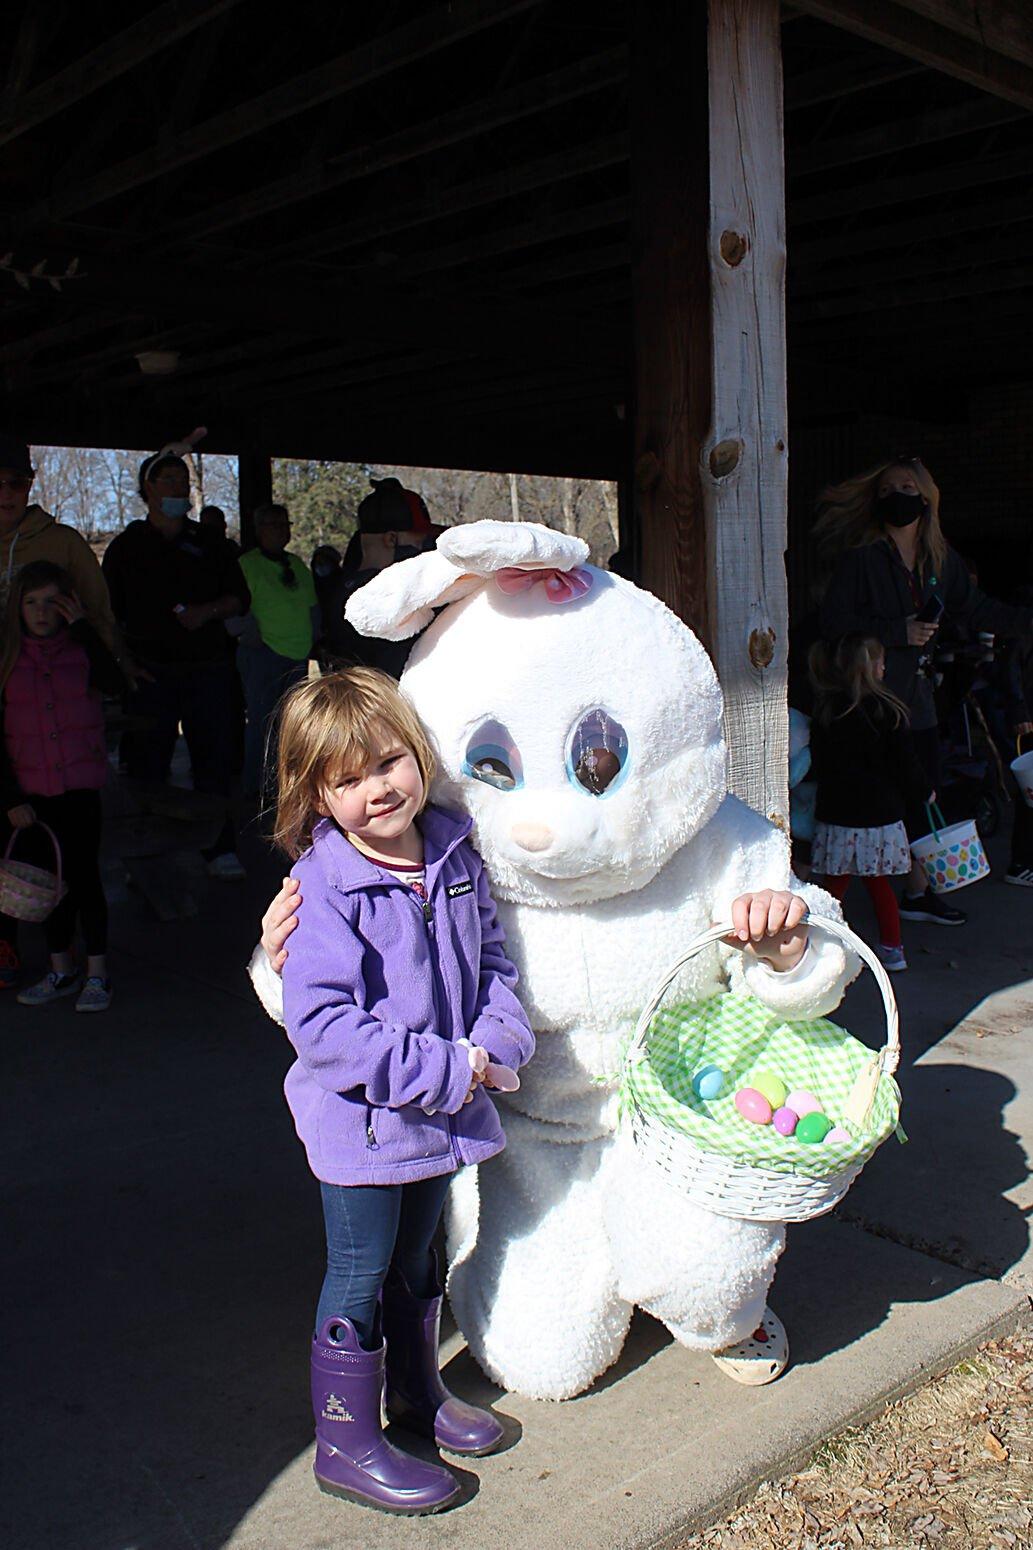 Palisade bunny_210407.jpg